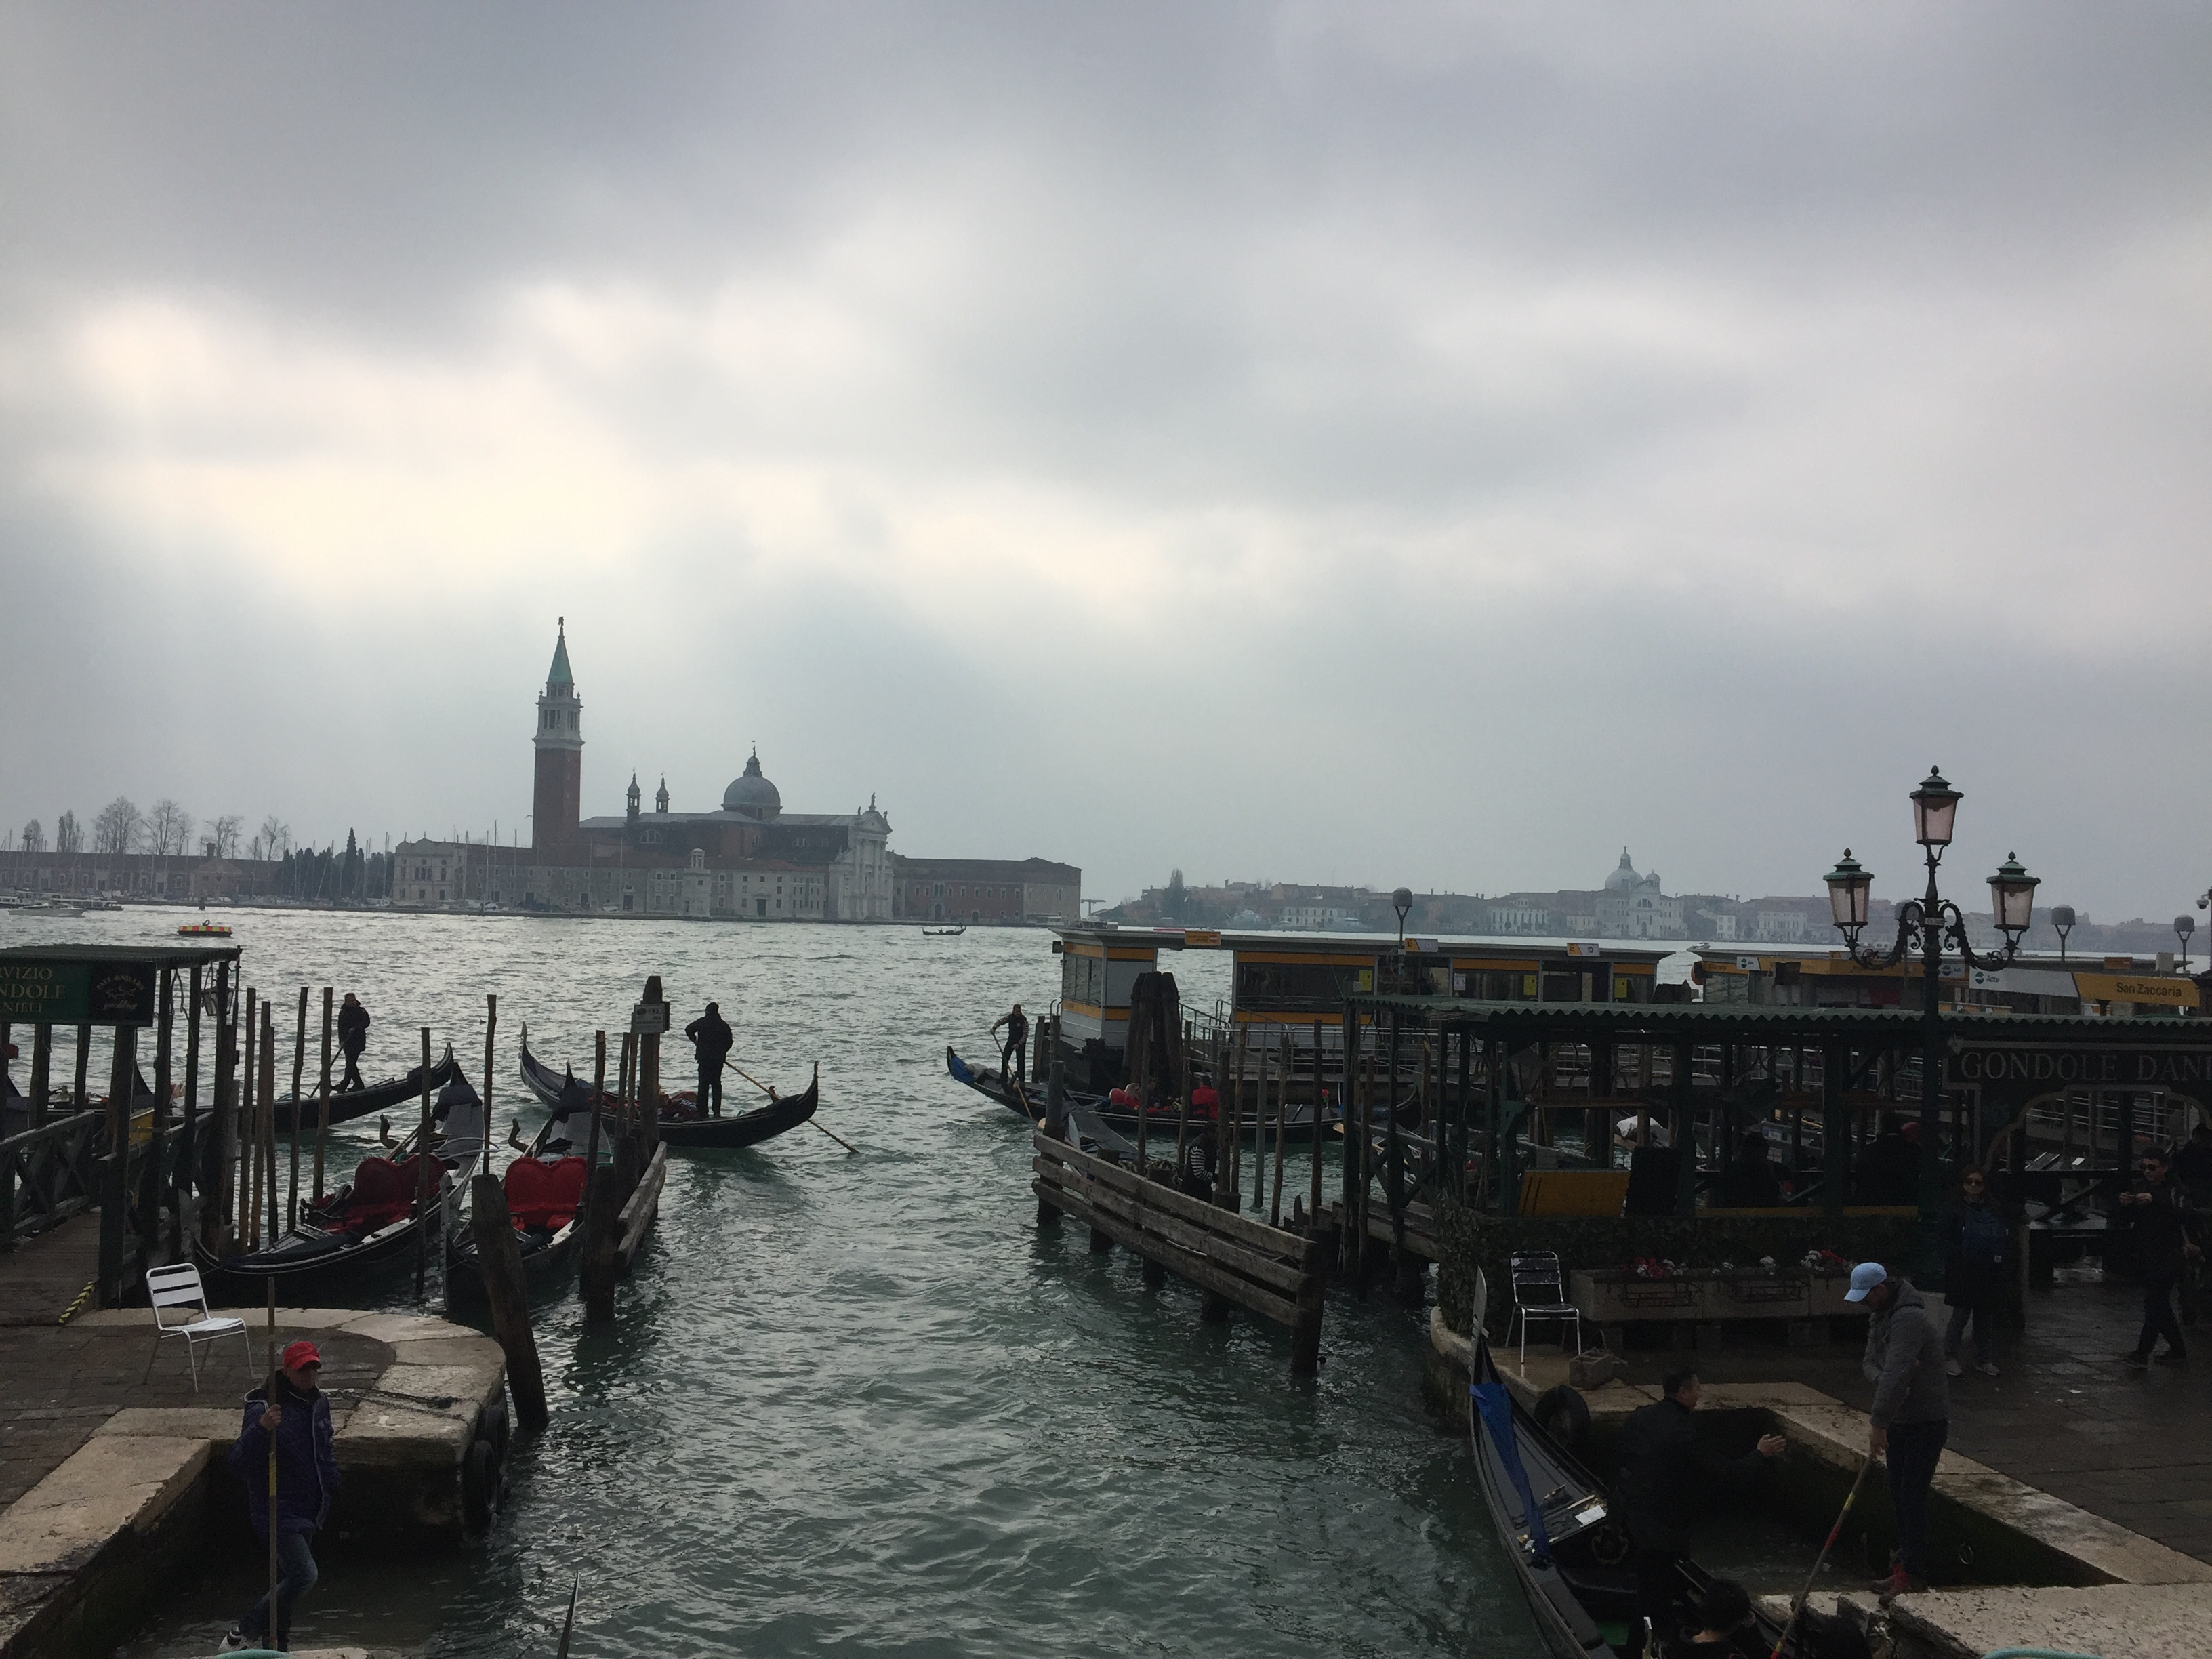 Will Venice still deliver magic when the weather is cold and gray? Photo credit: Michael Ciavardini